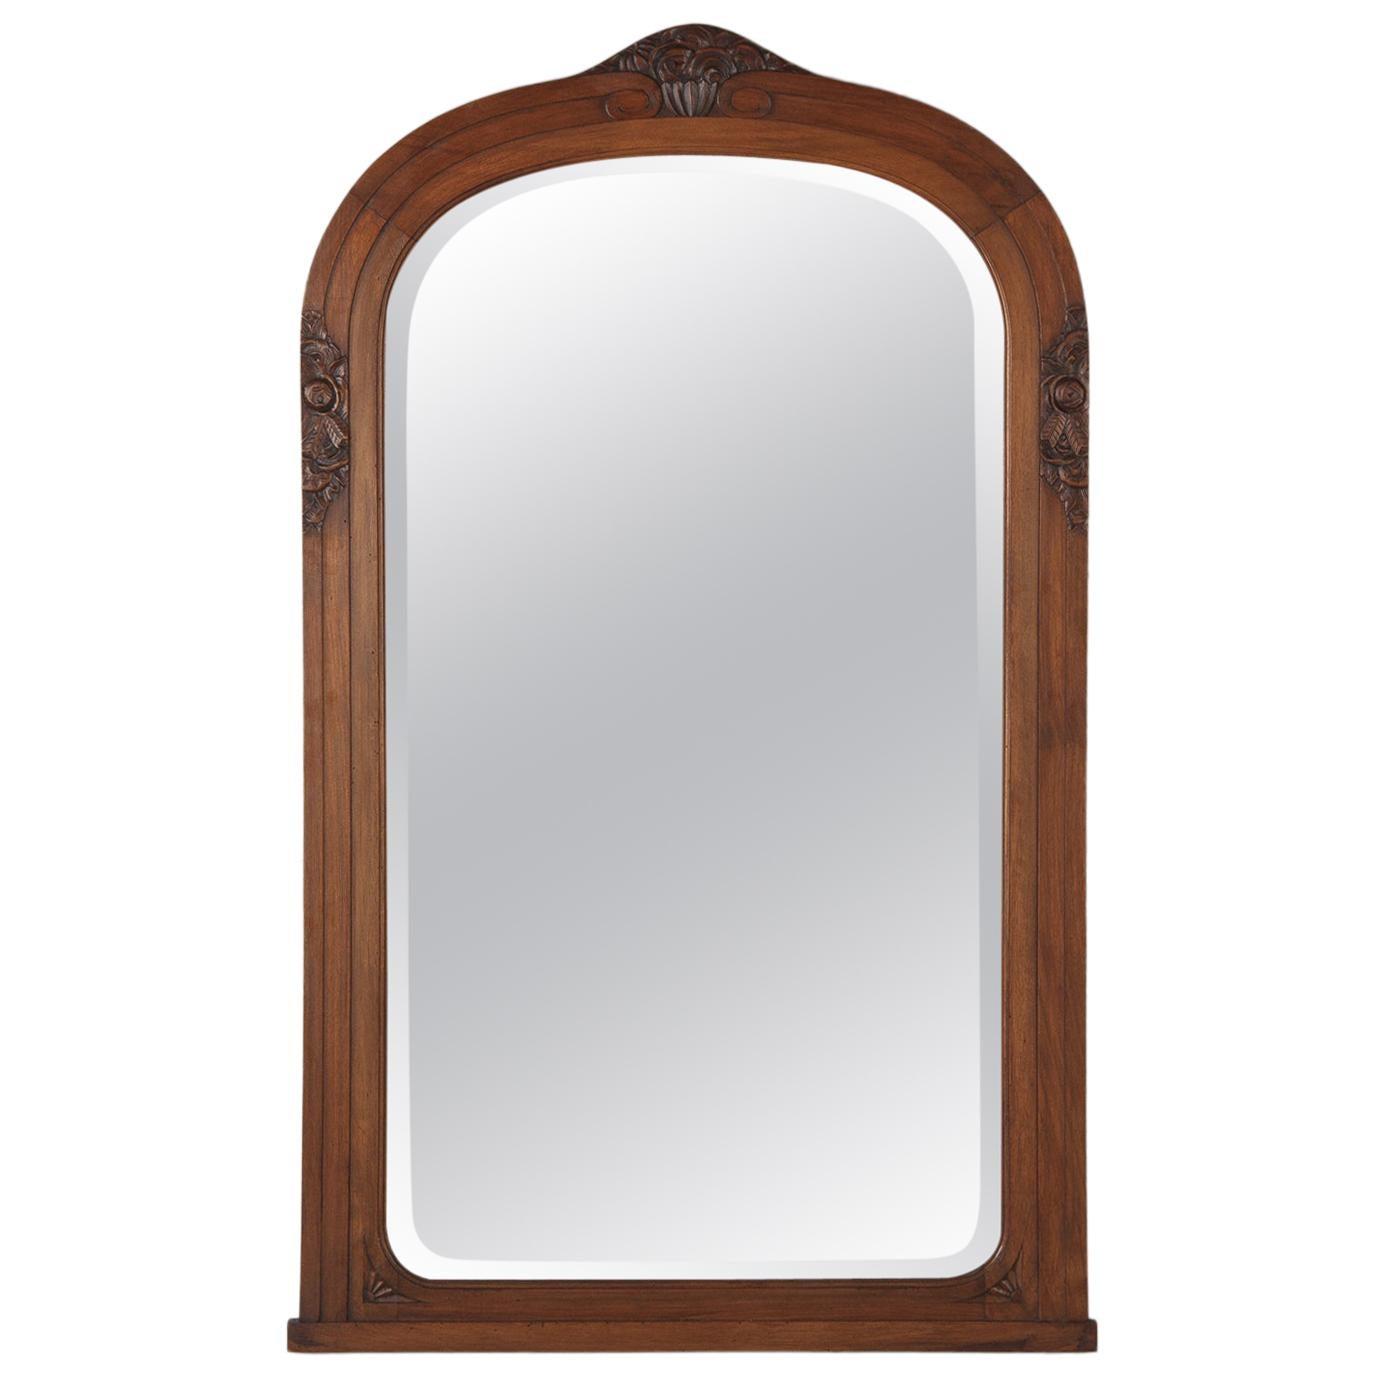 French Art Deco Walnut Frame Beveled Mirror, 1930s